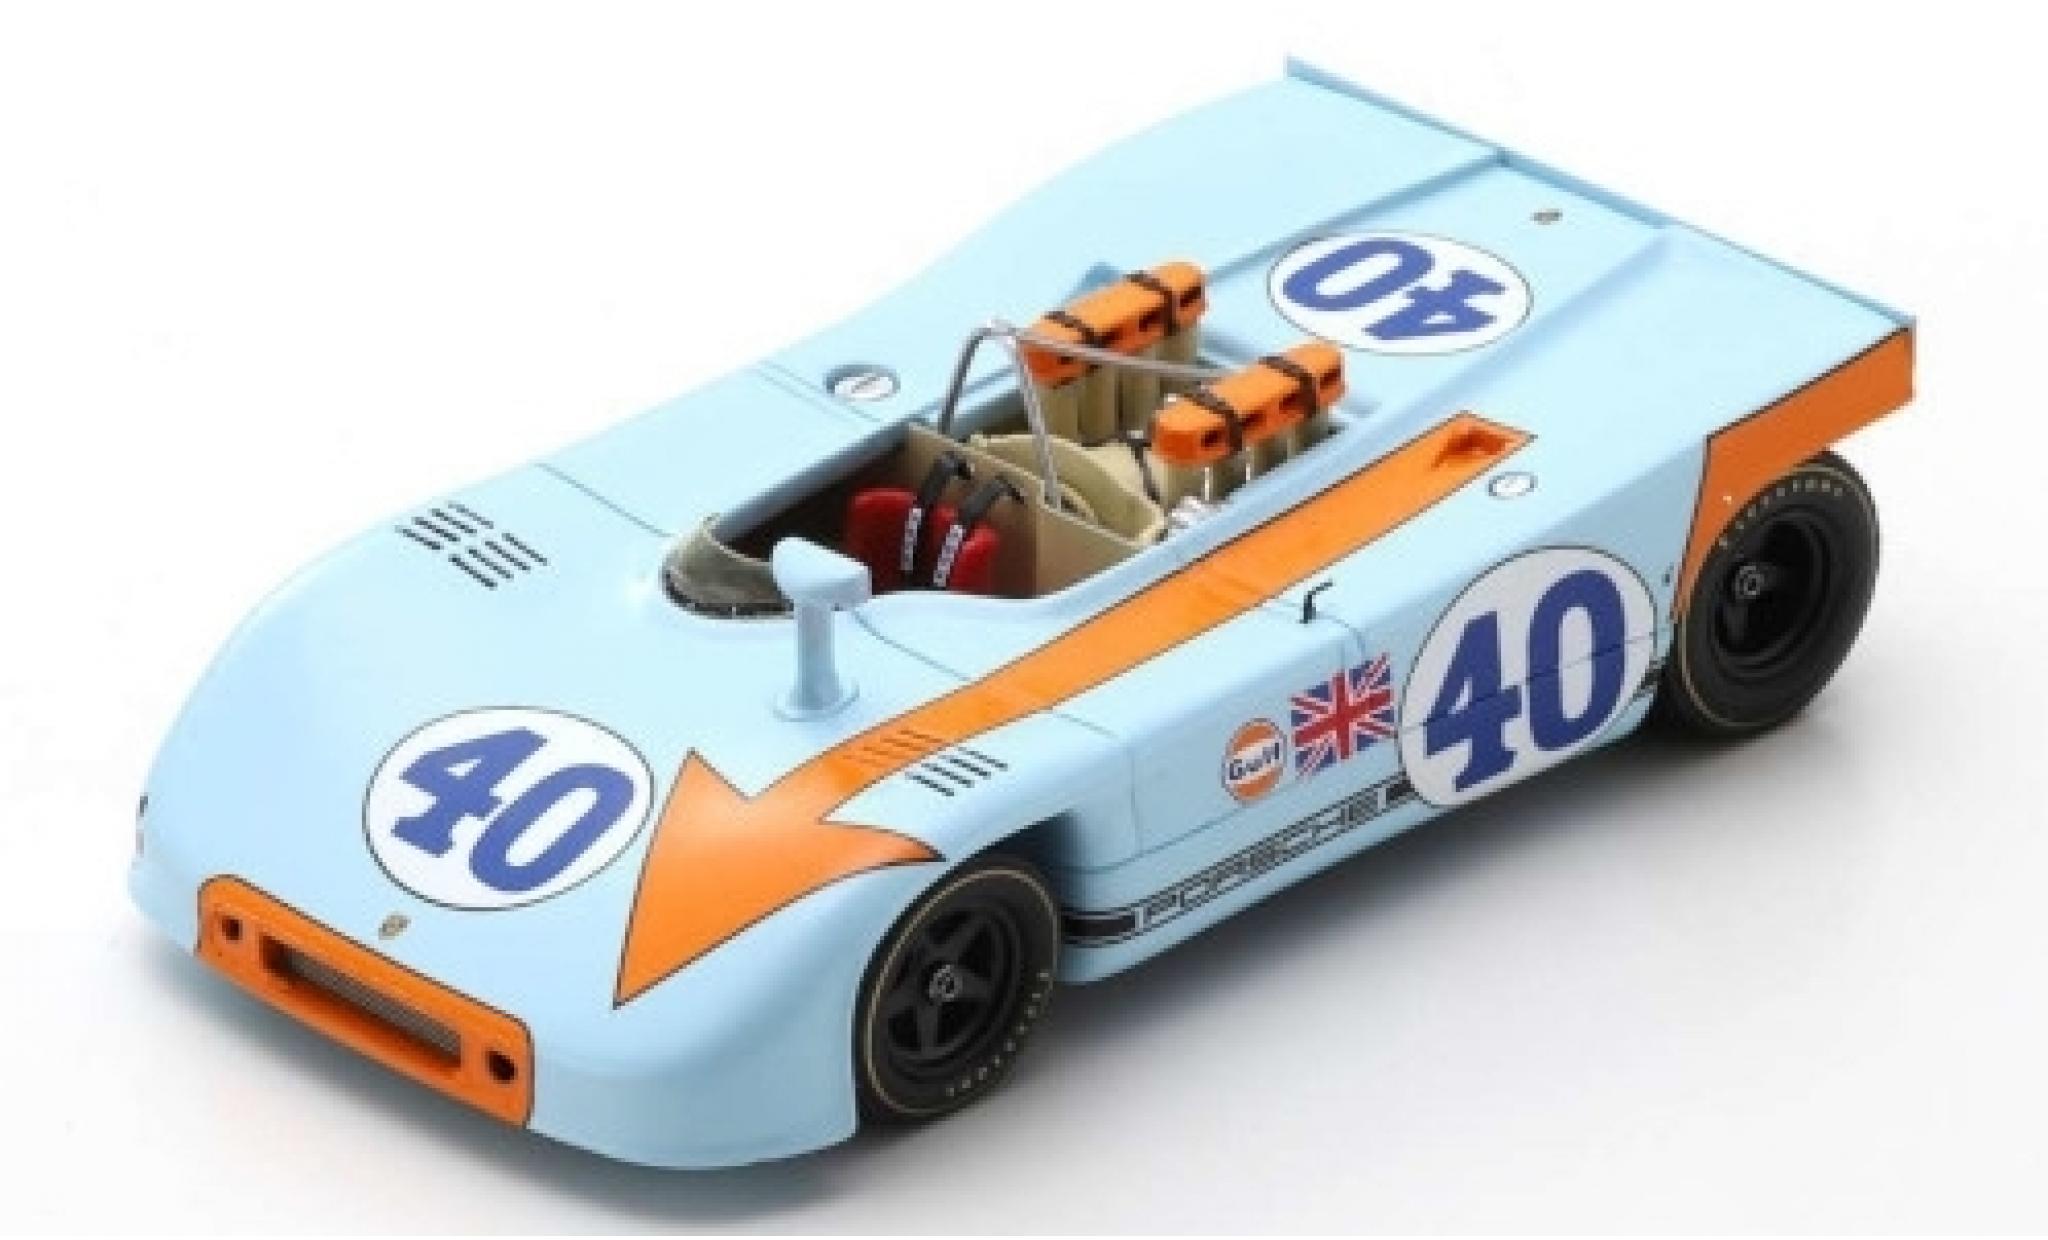 Porsche 908 1970 1/43 Spark /03 RHD No.40 J. W. Automotive Engineering Targa Florio P.Rodriguez/L.Kinnunen